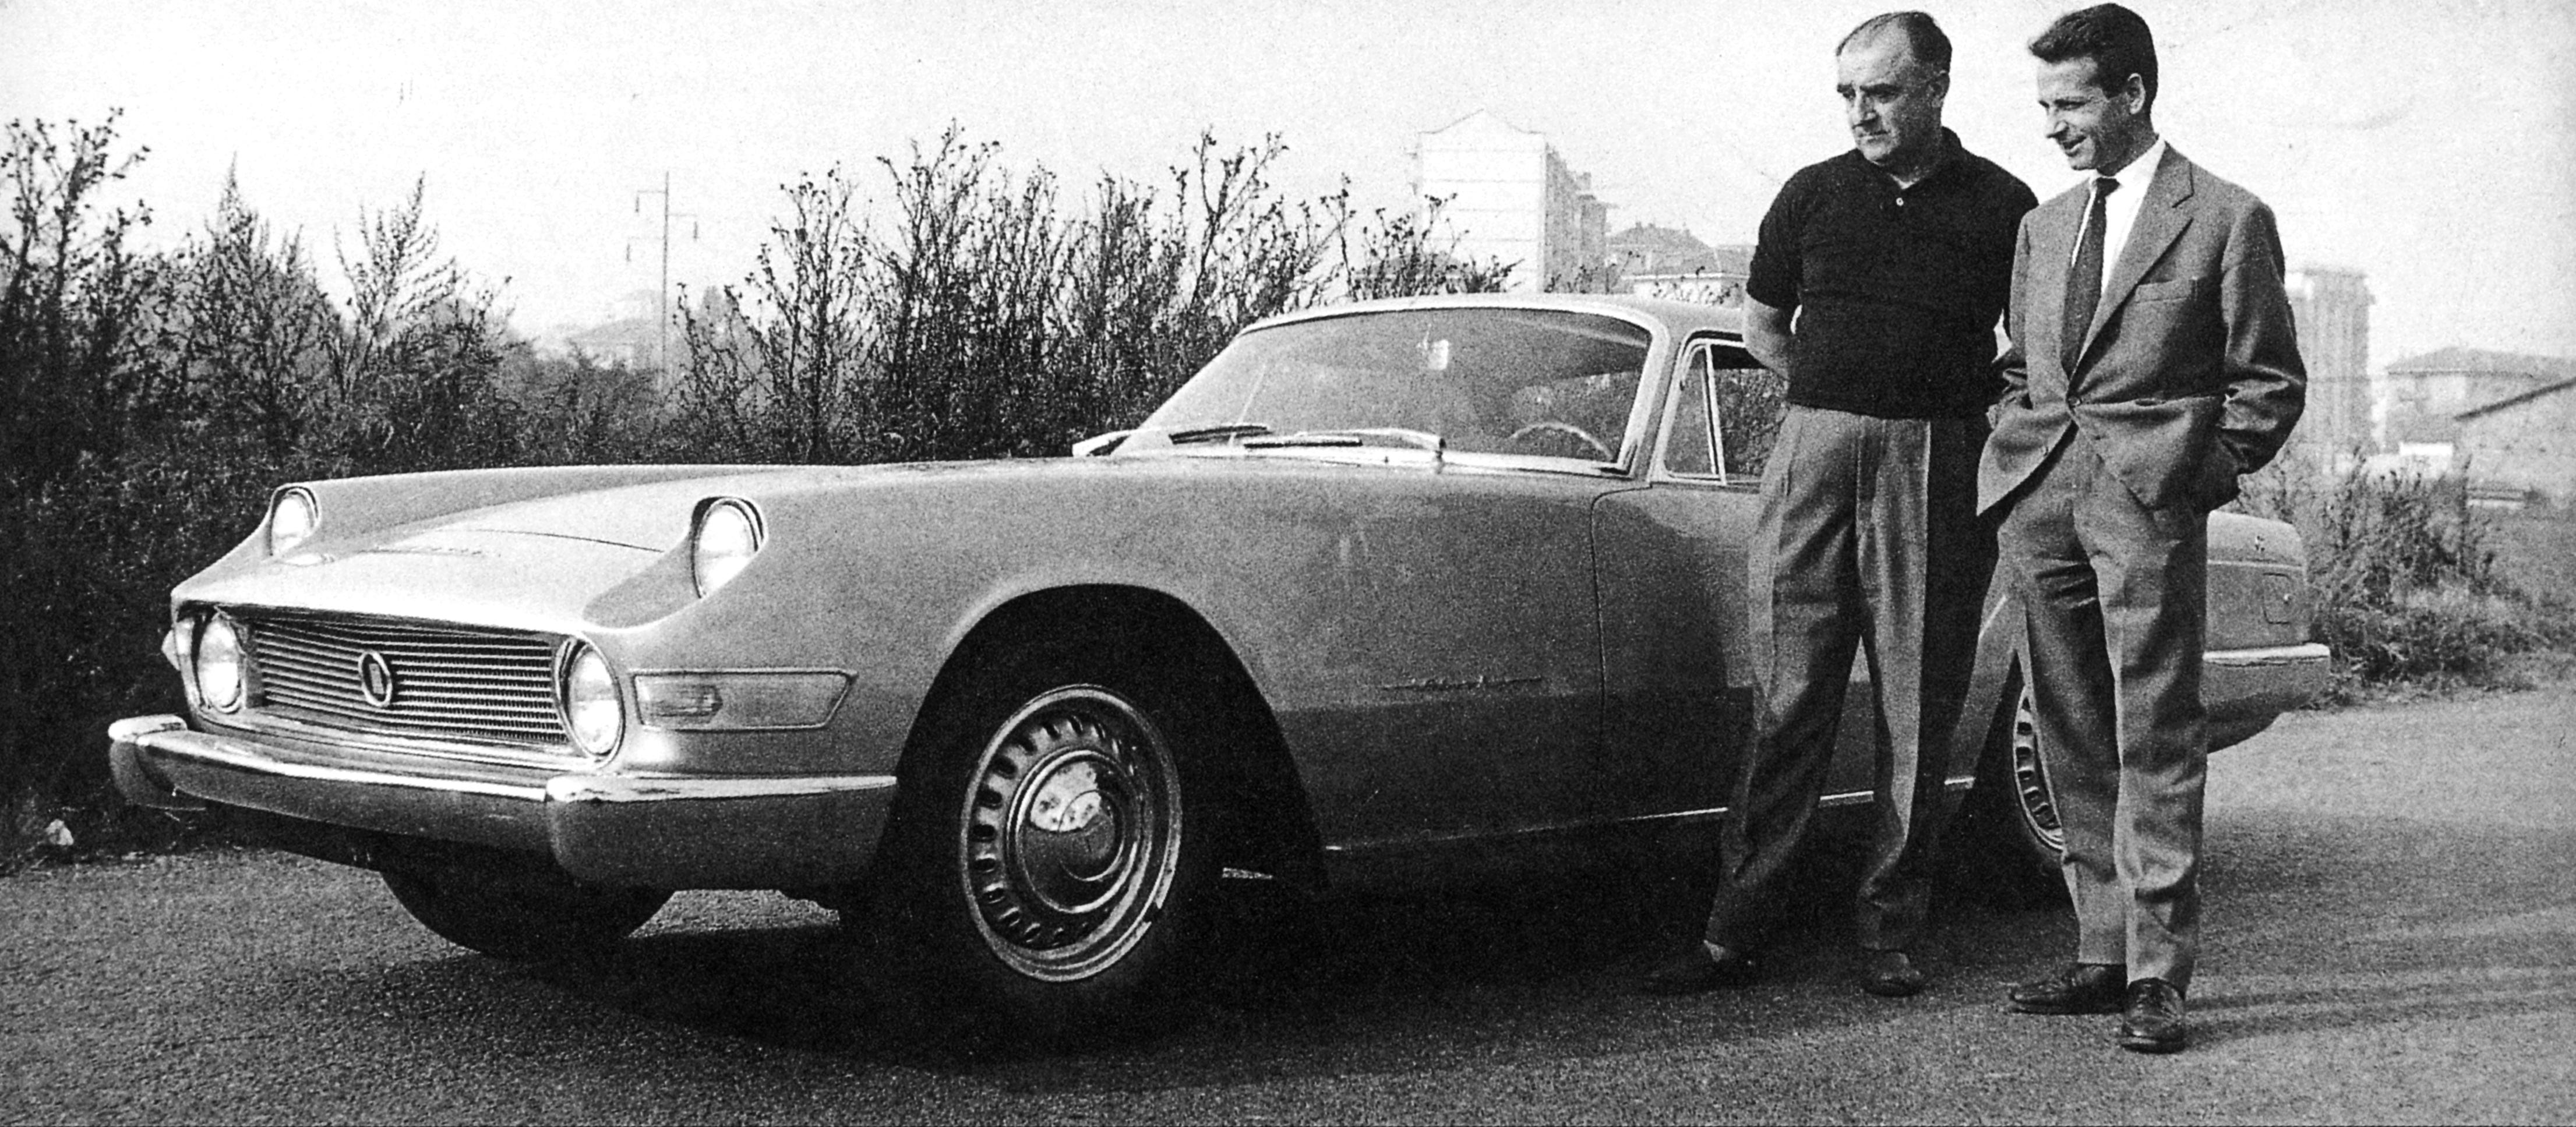 1960 michelotti nardi-plymouth silver ray 06.jpg